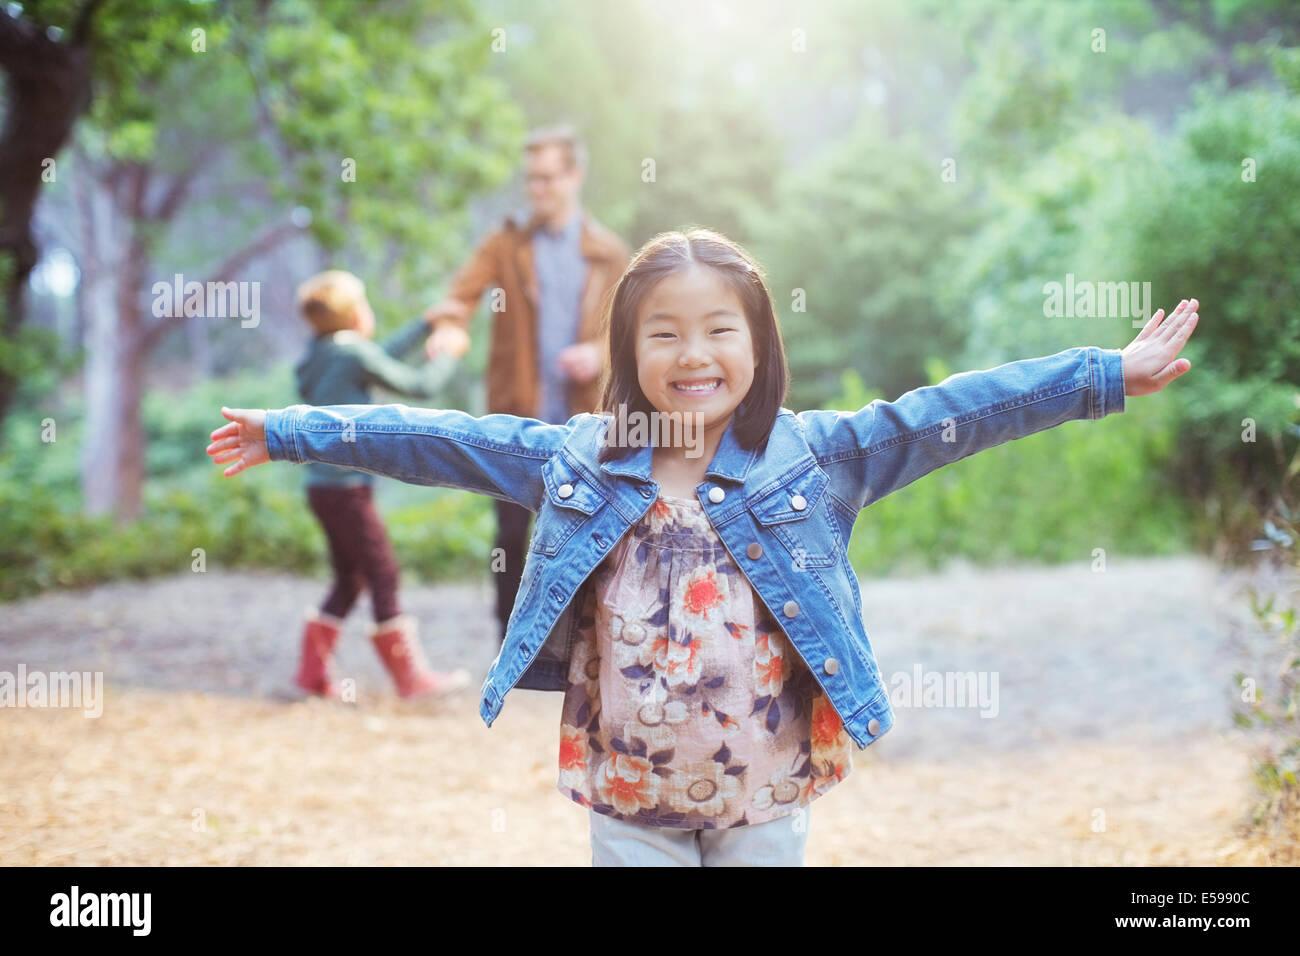 Mädchen im Wald jubelt Stockbild